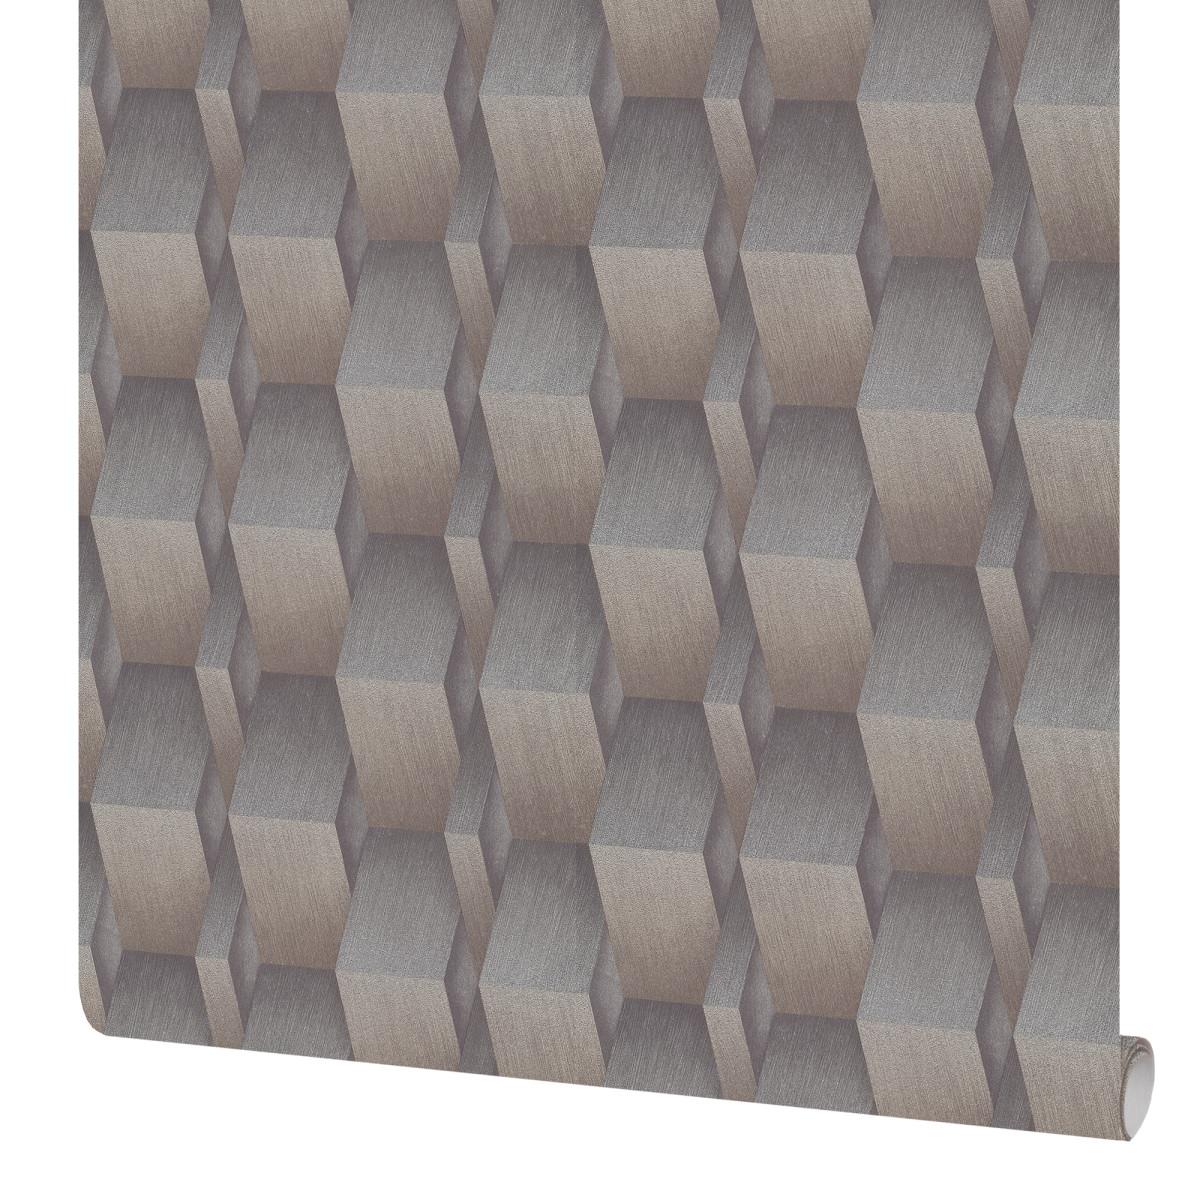 Обои флизелиновые Erismann Fashion for walls серо-коричневые 1.06 м 12036-30